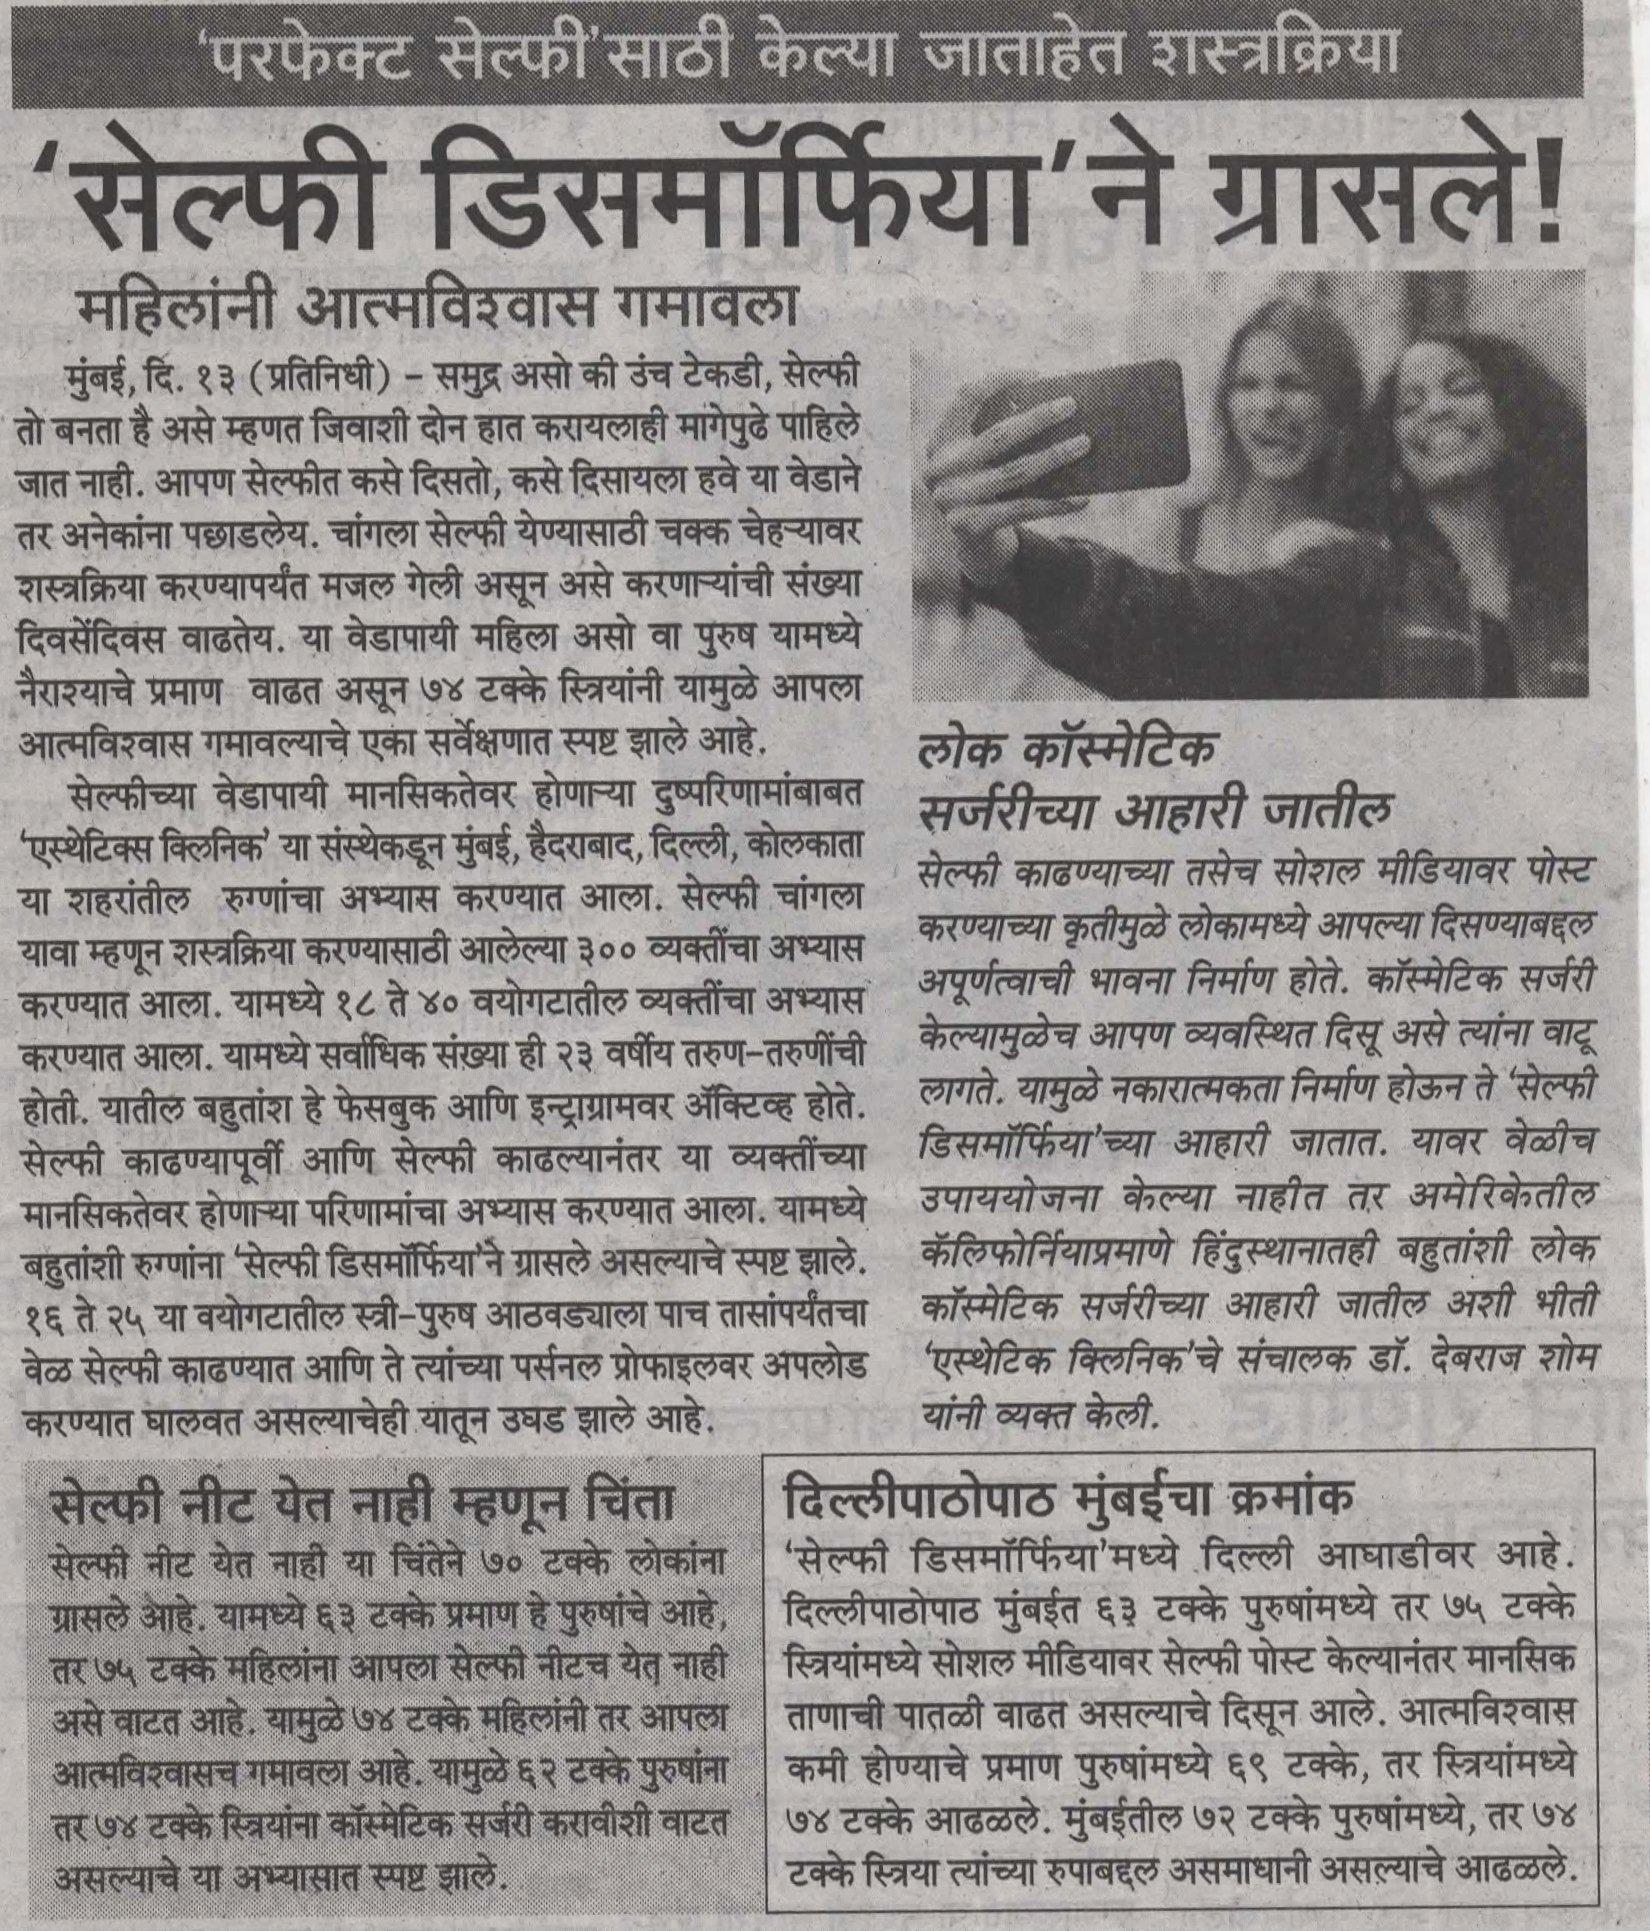 Selfie Dysmorphia increase in India - Samana